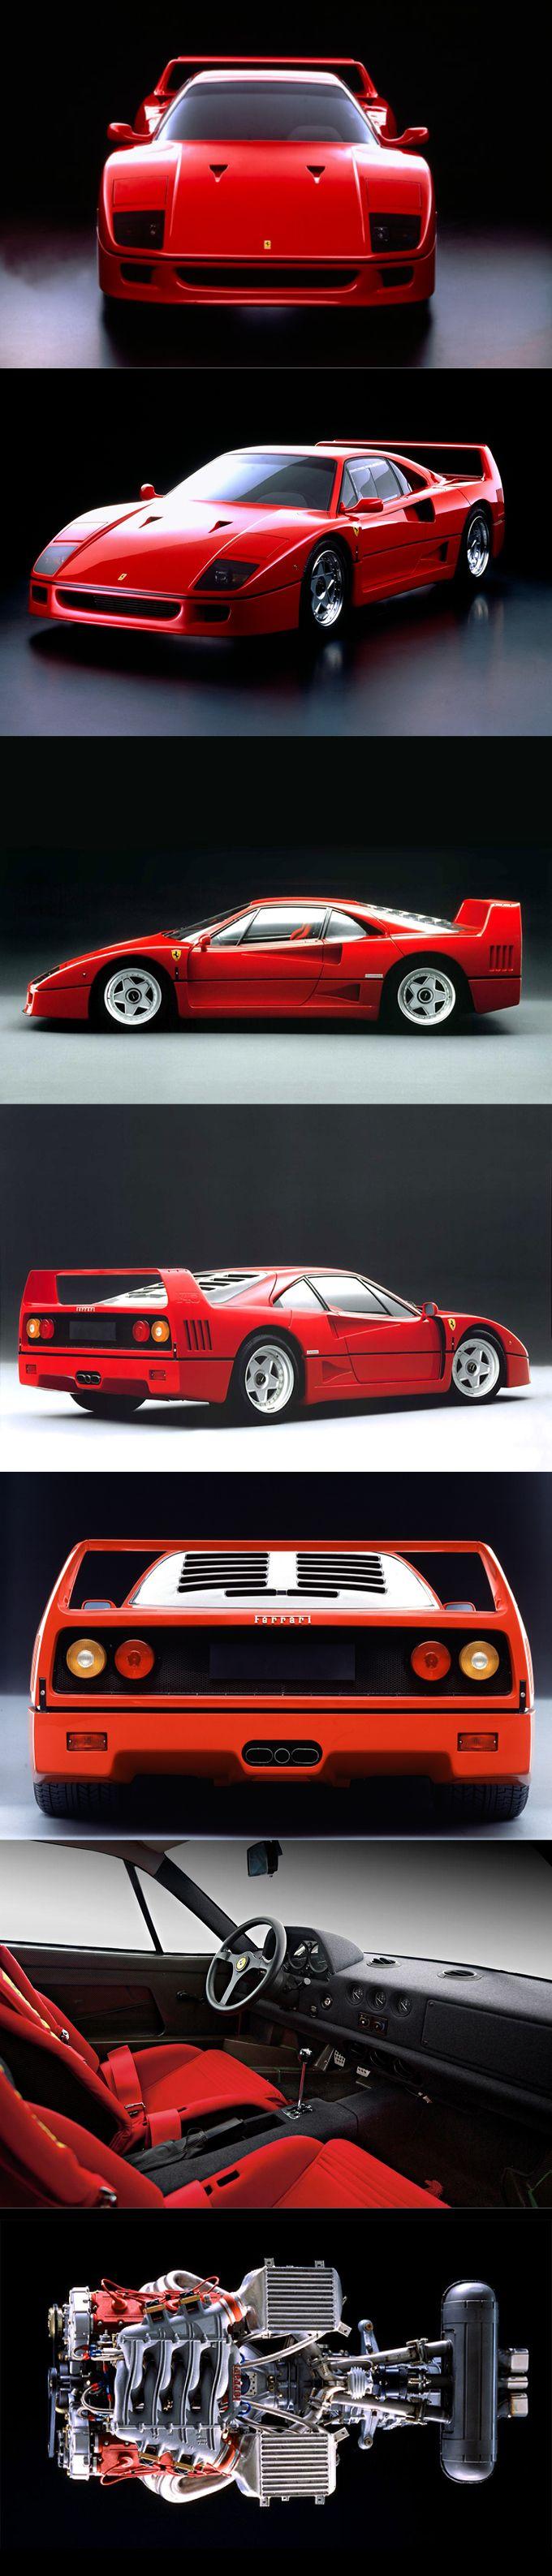 1987 Ferrari F40 / 1311pcs / 471hp / red / Italy